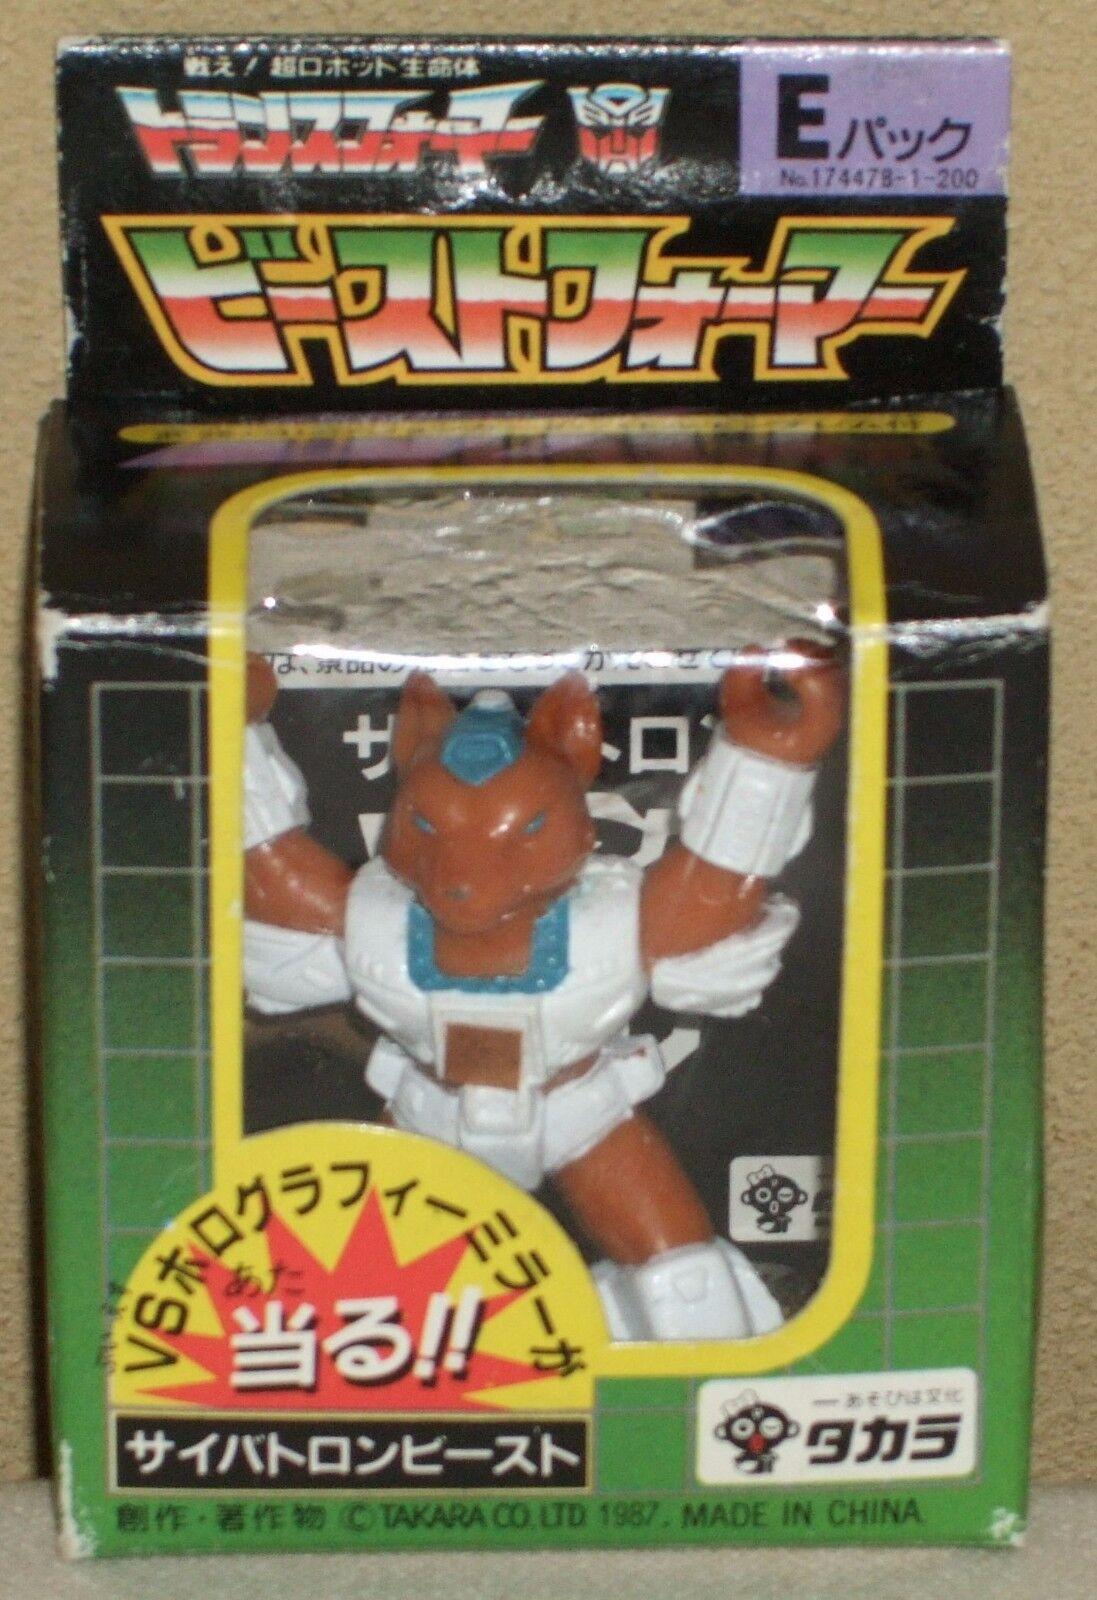 Transformers Cybertron Bestia E-Pack se-Fox 5cm 2 Figuras Muñecas Takara 2018 Rara